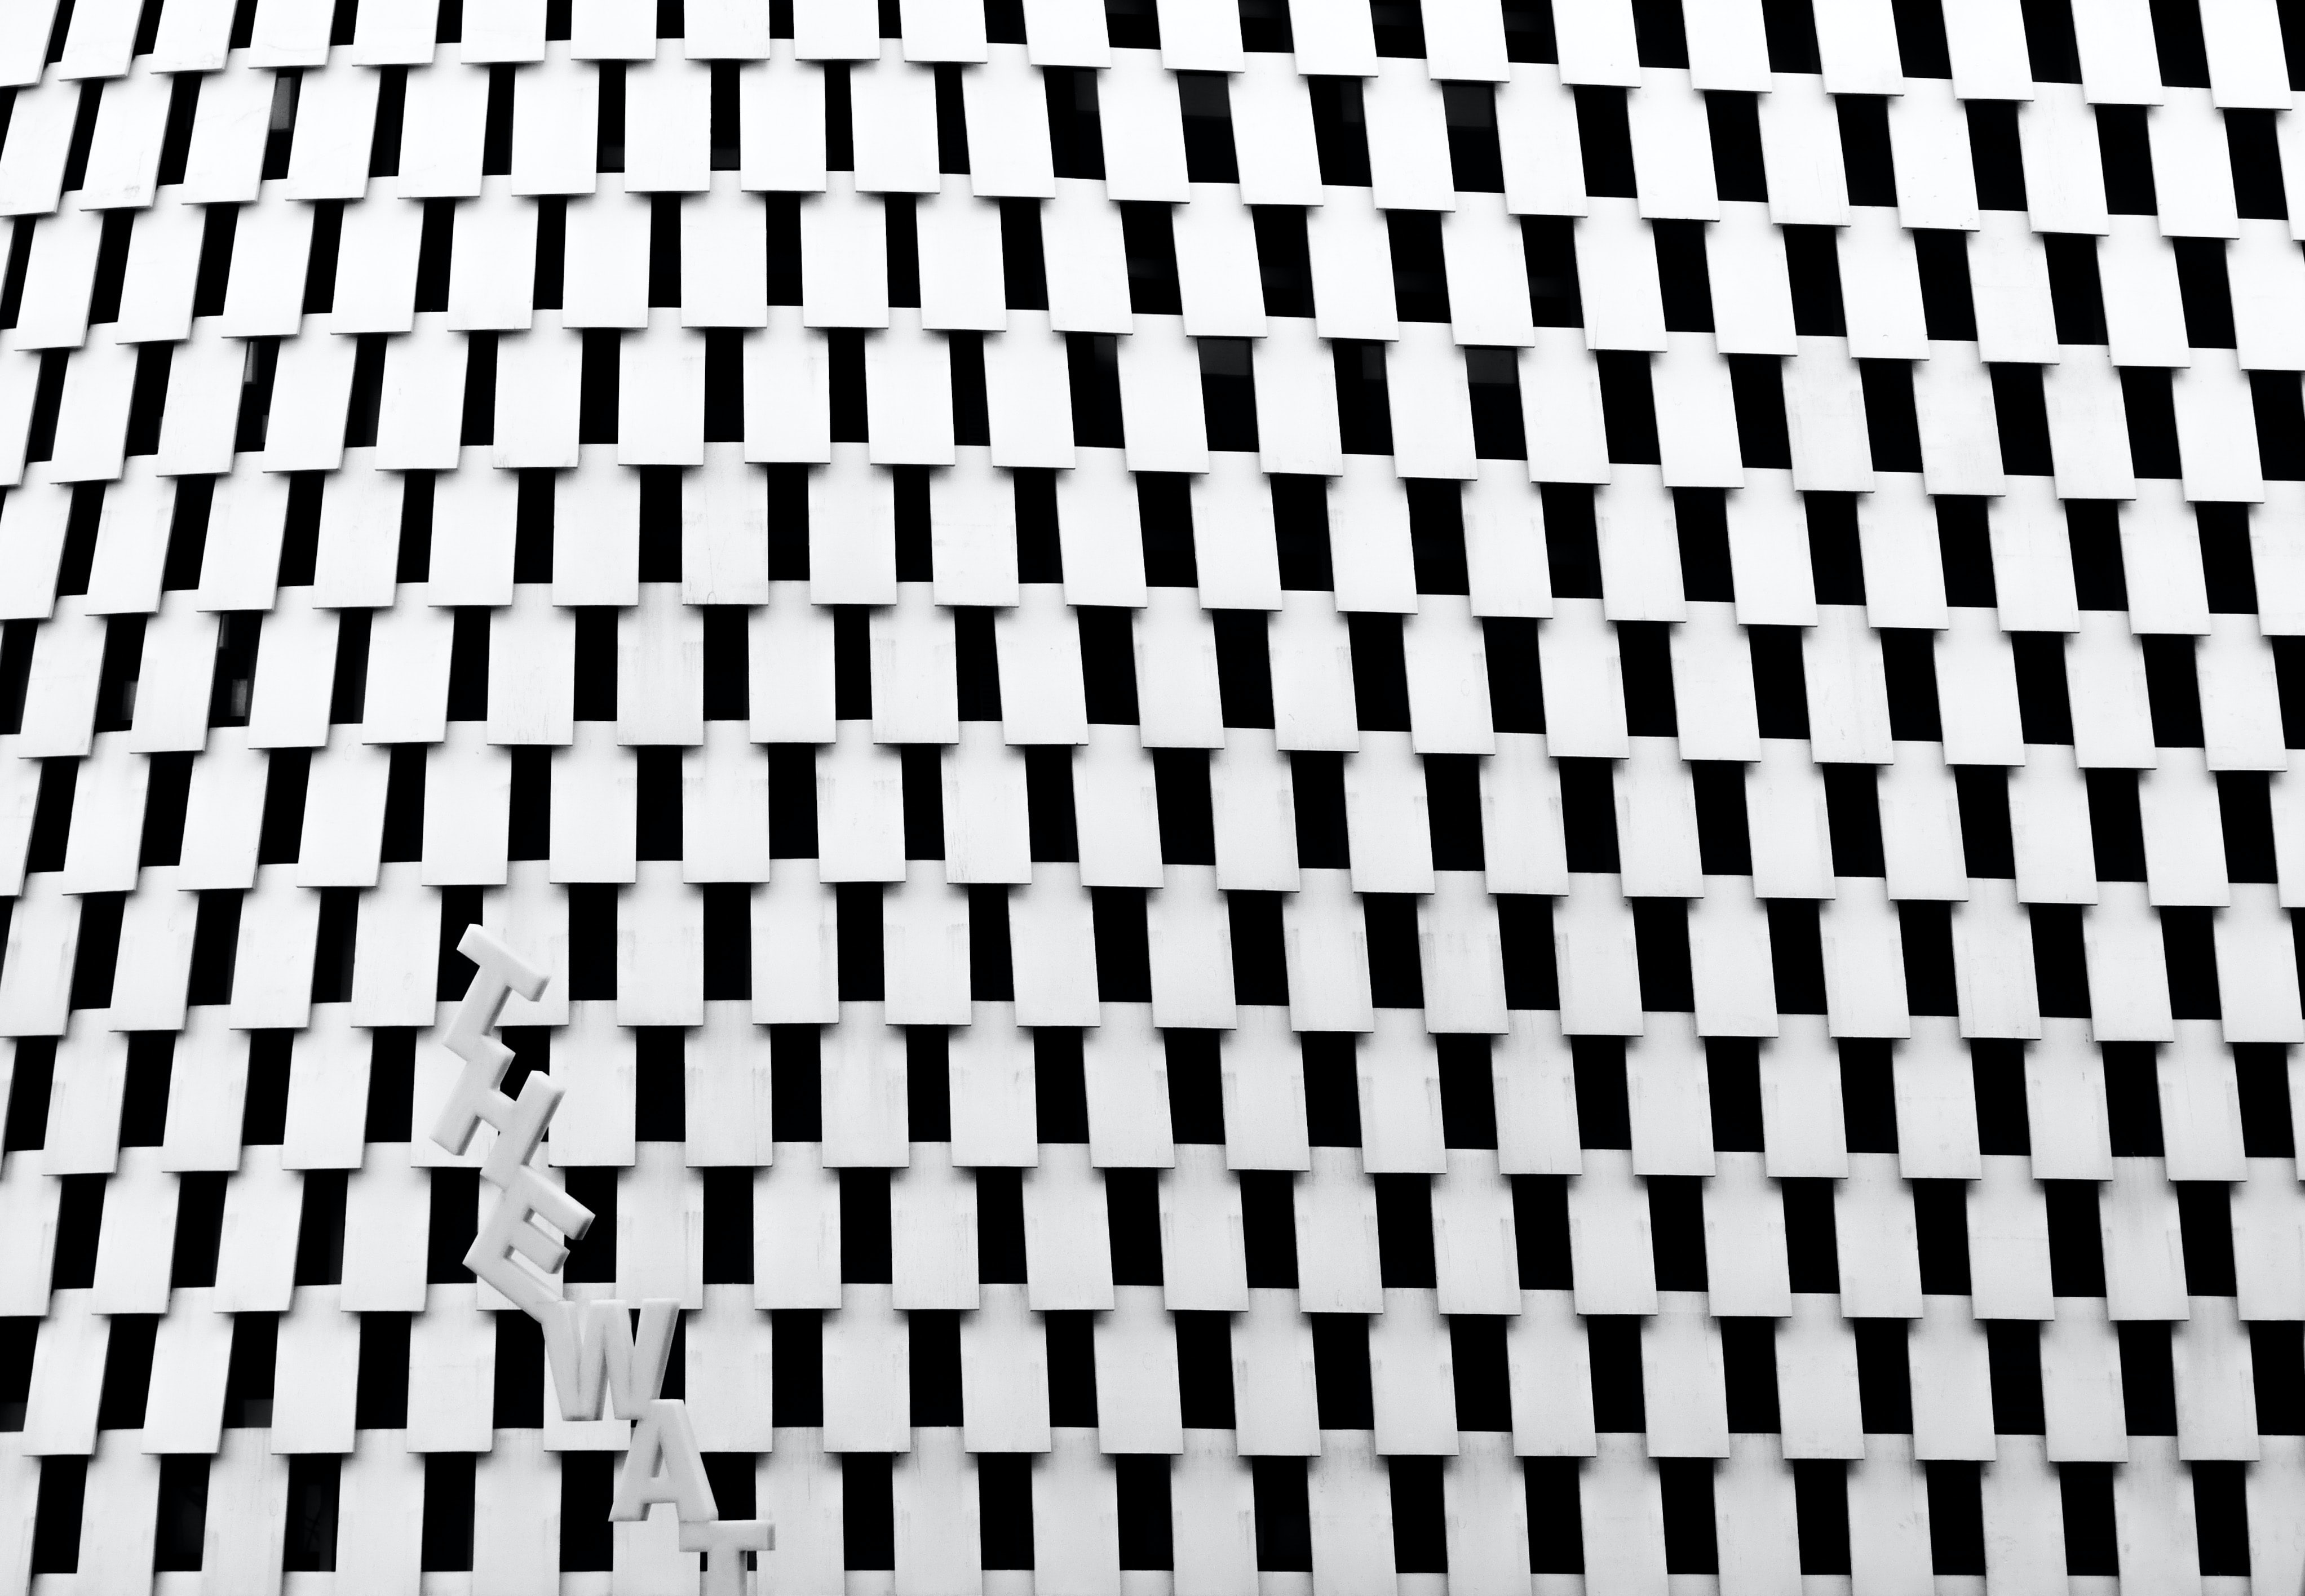 Free Unsplash photo from Davide Cantelli